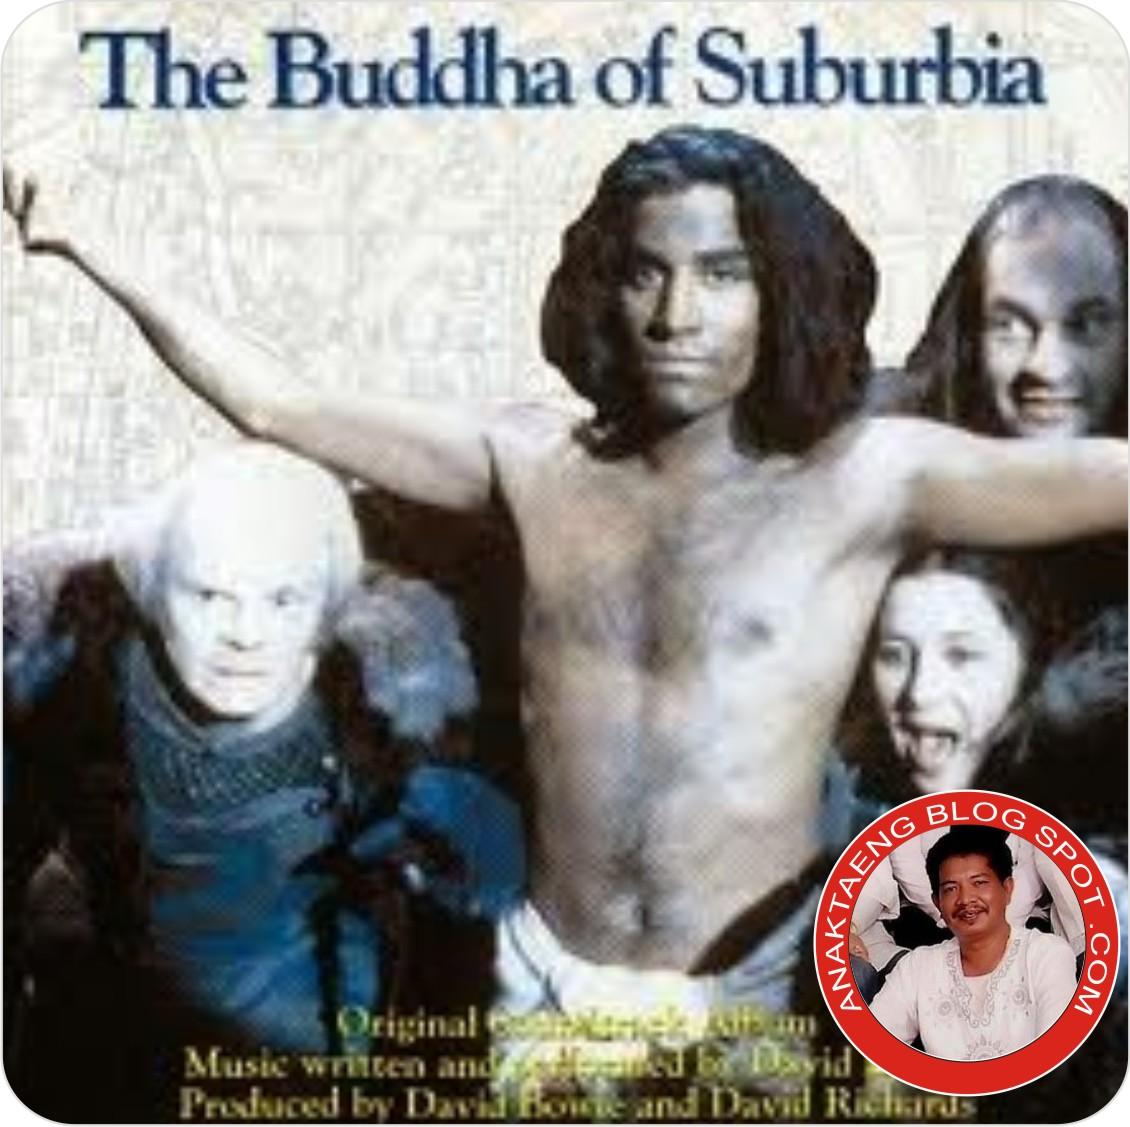 Download Lagu Untuk Dikenang By Anak Taeng David Bowie